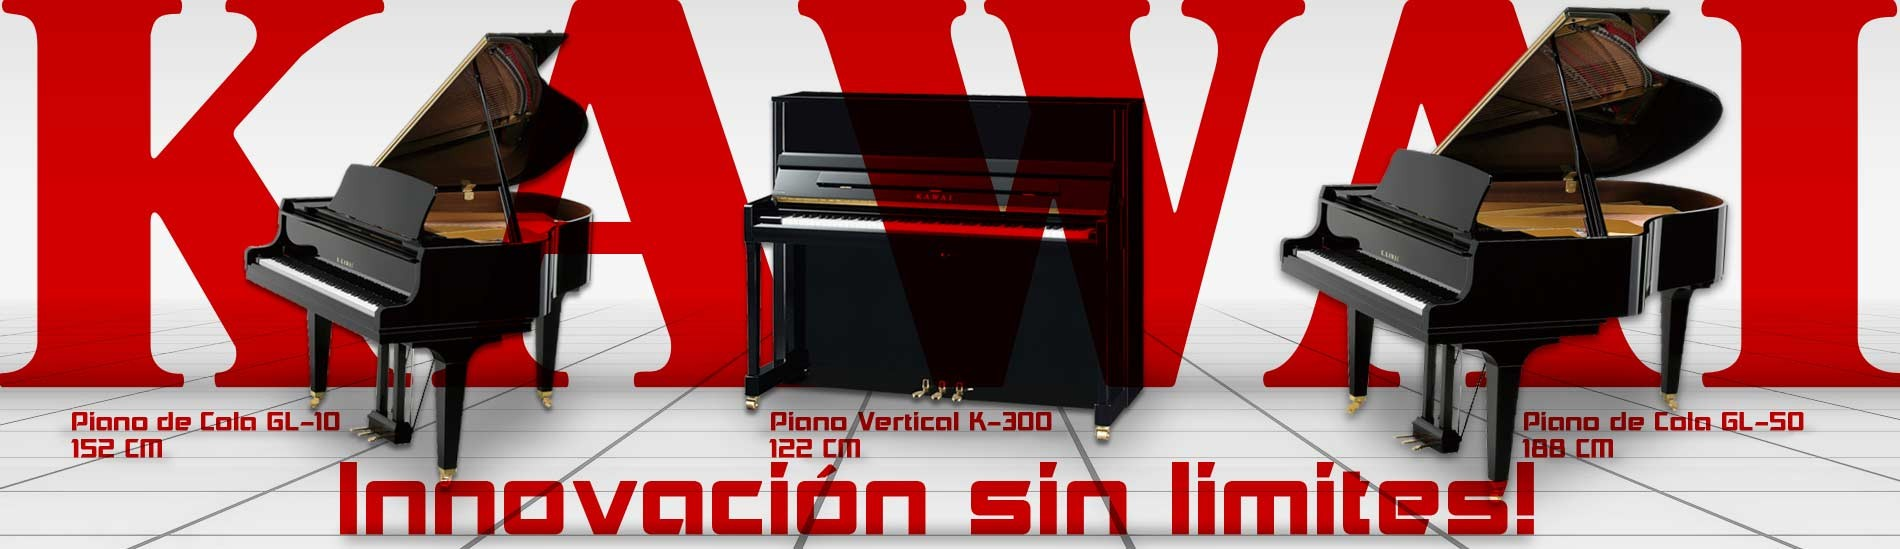 Pianos Acústicos Kawai - Innovación sin limites!